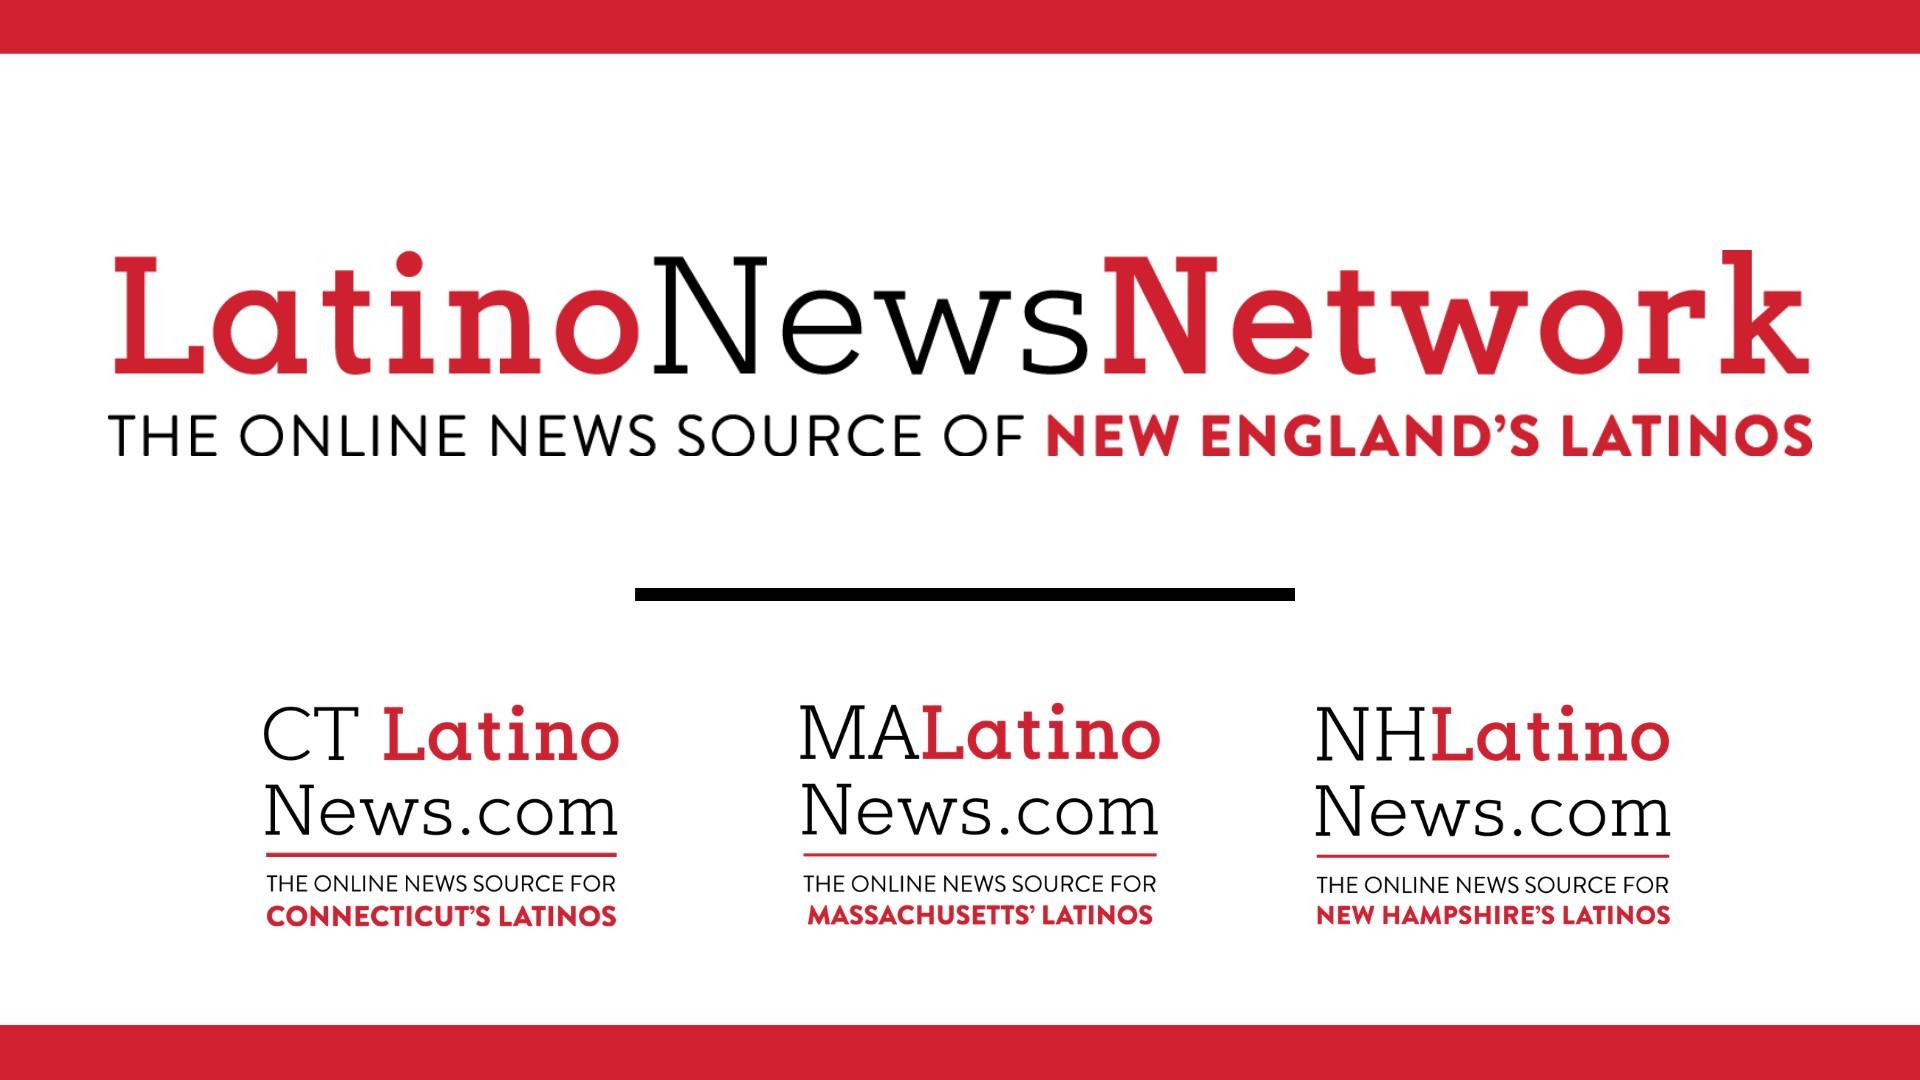 Latino News Network | LinkedIn